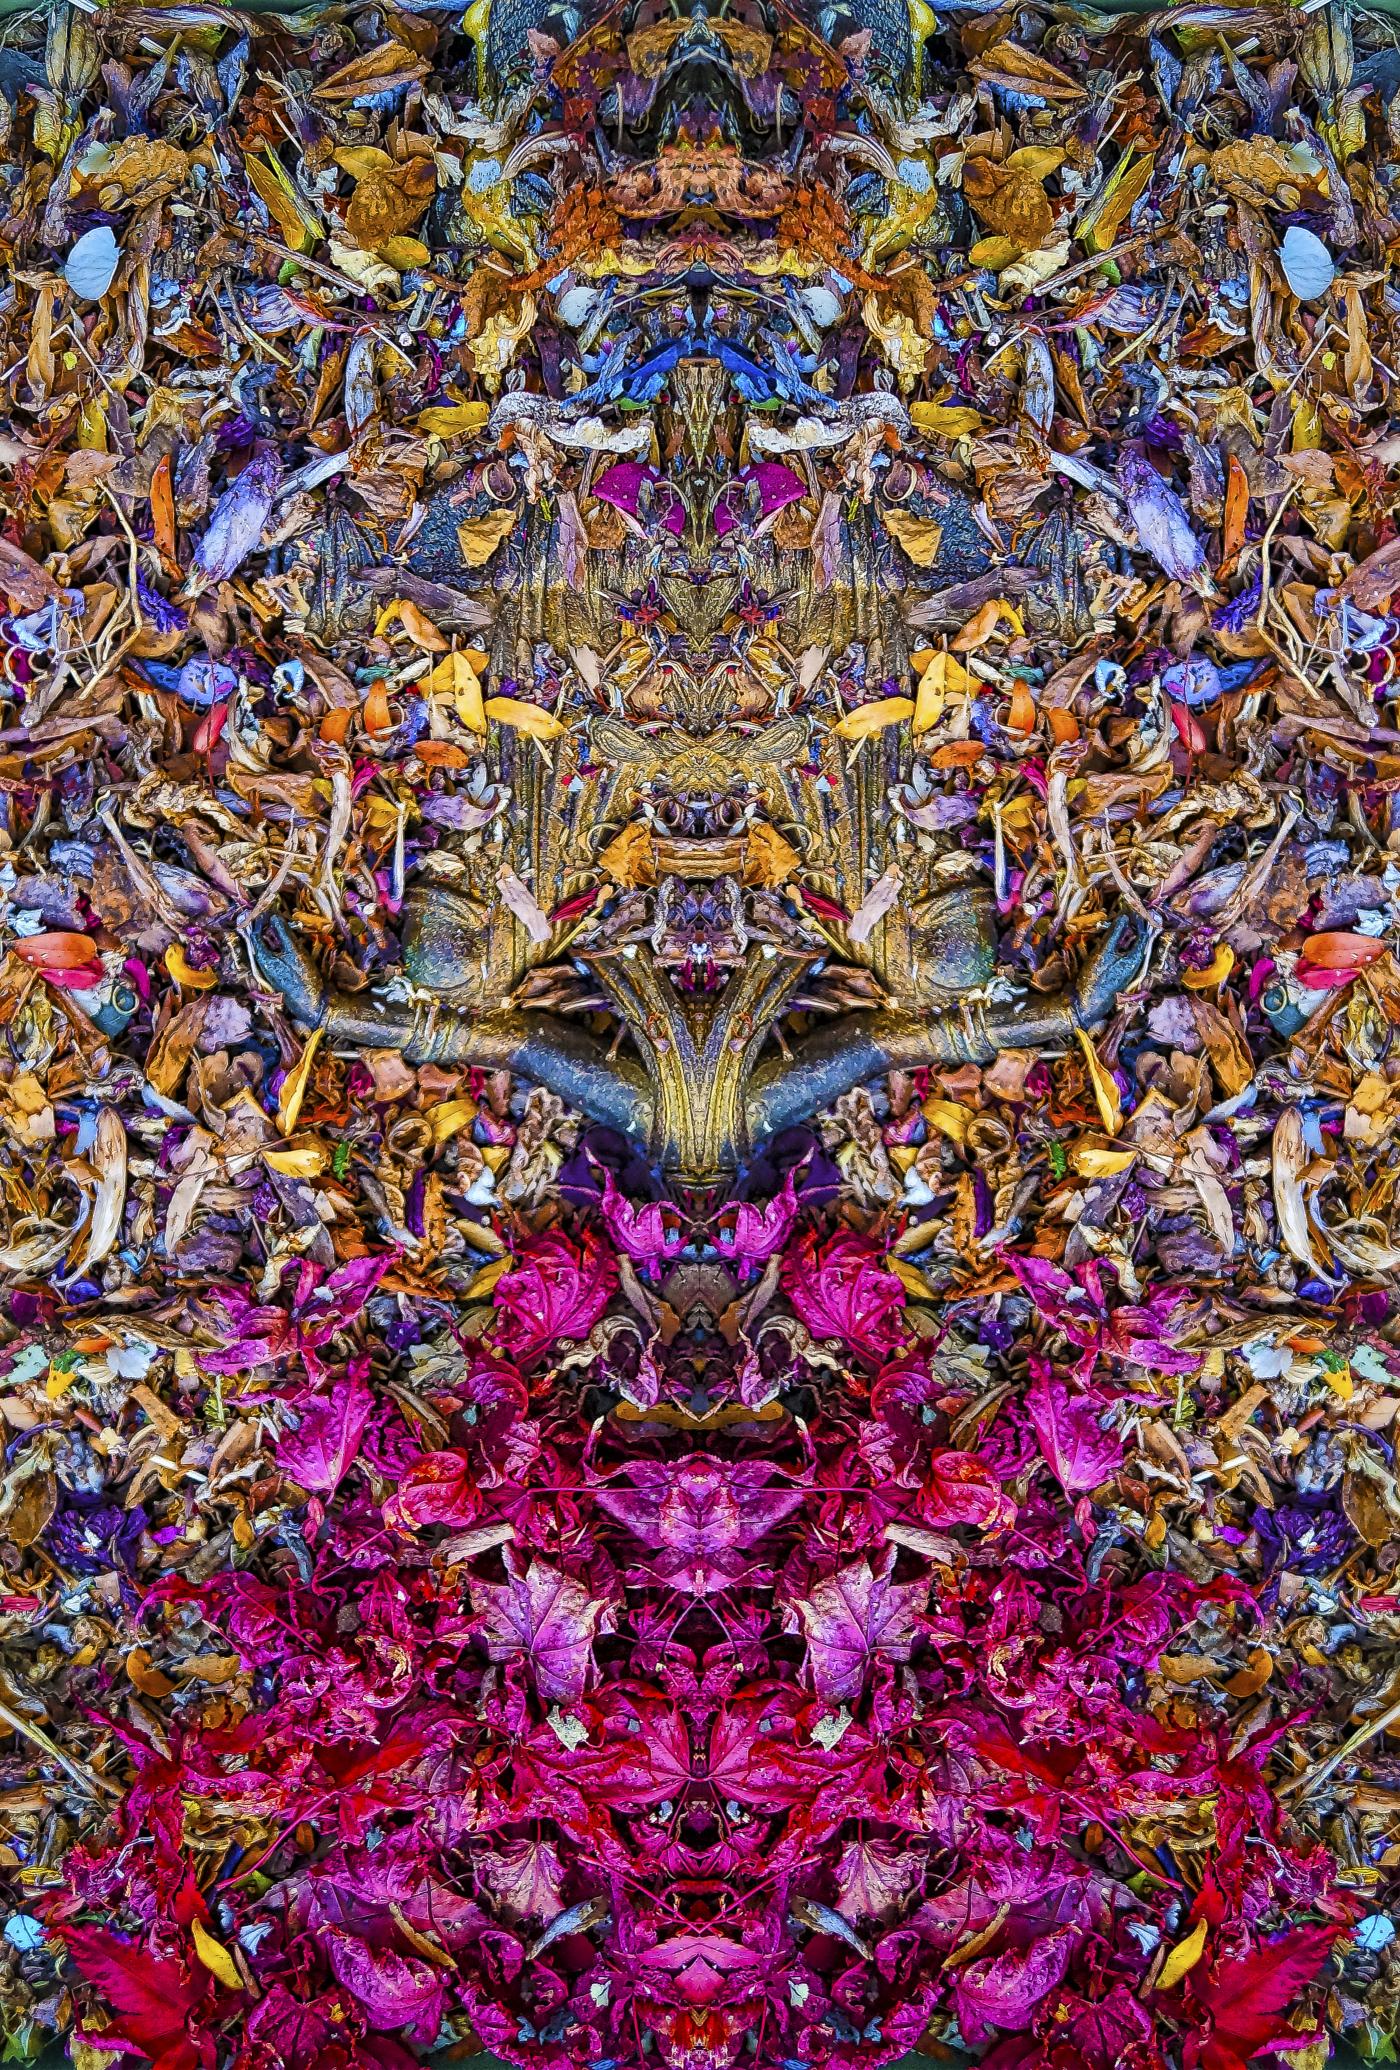 Stephen Calhoun artist